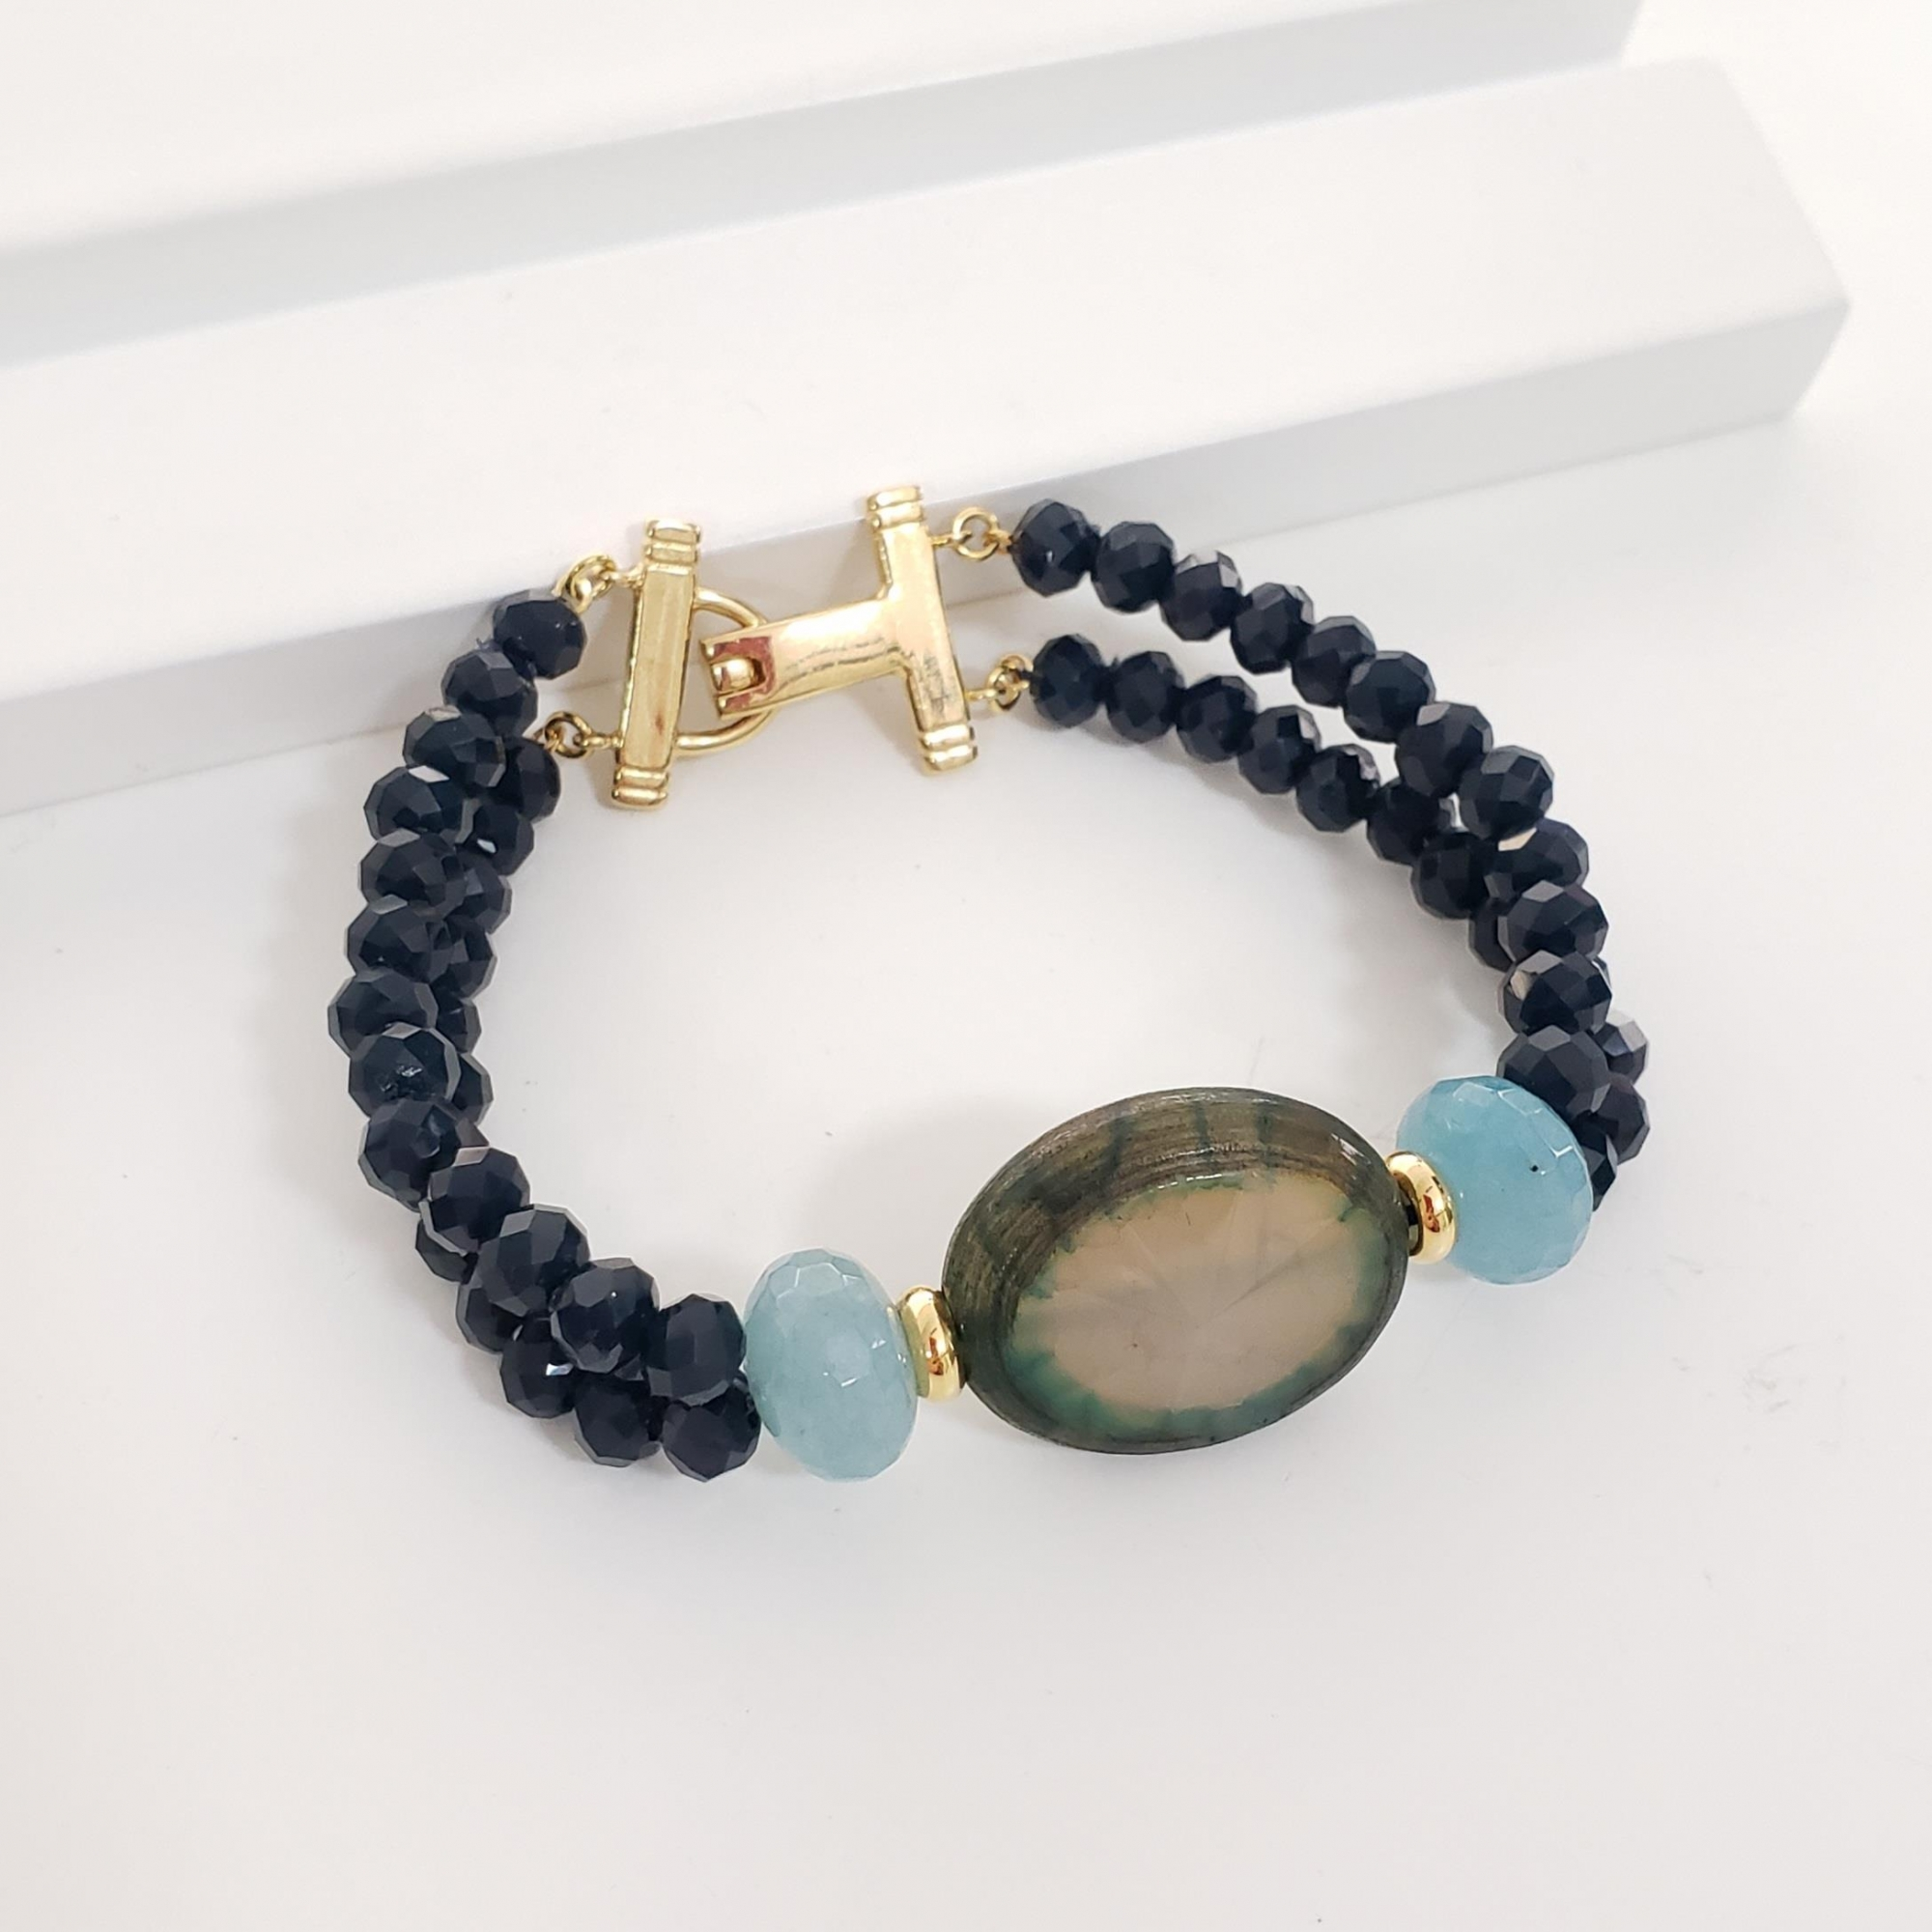 Pulseira Azul Safira com Angelita e Agata Teal no Banho Ouro 18k Semijoia